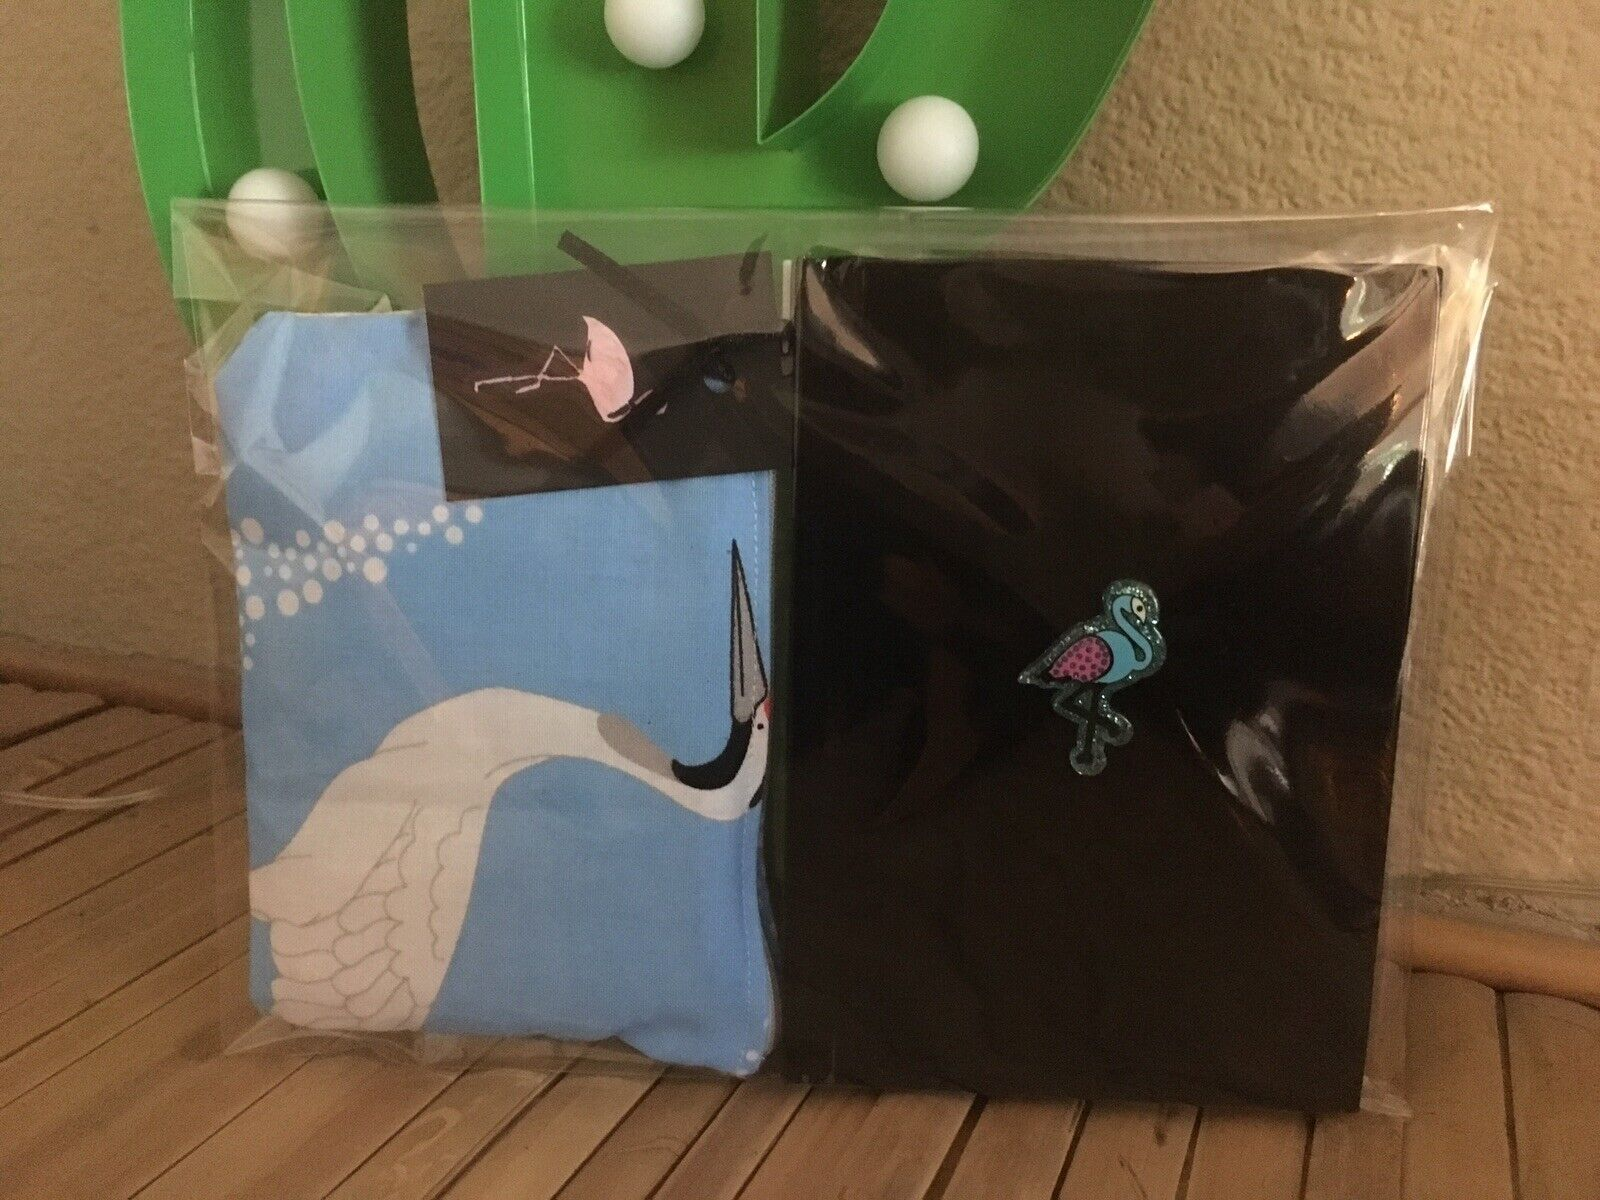 Blue Oriental Crane Bird Purse +Black A6 Hardback Flamingo Notebook 2Pc Gift Set